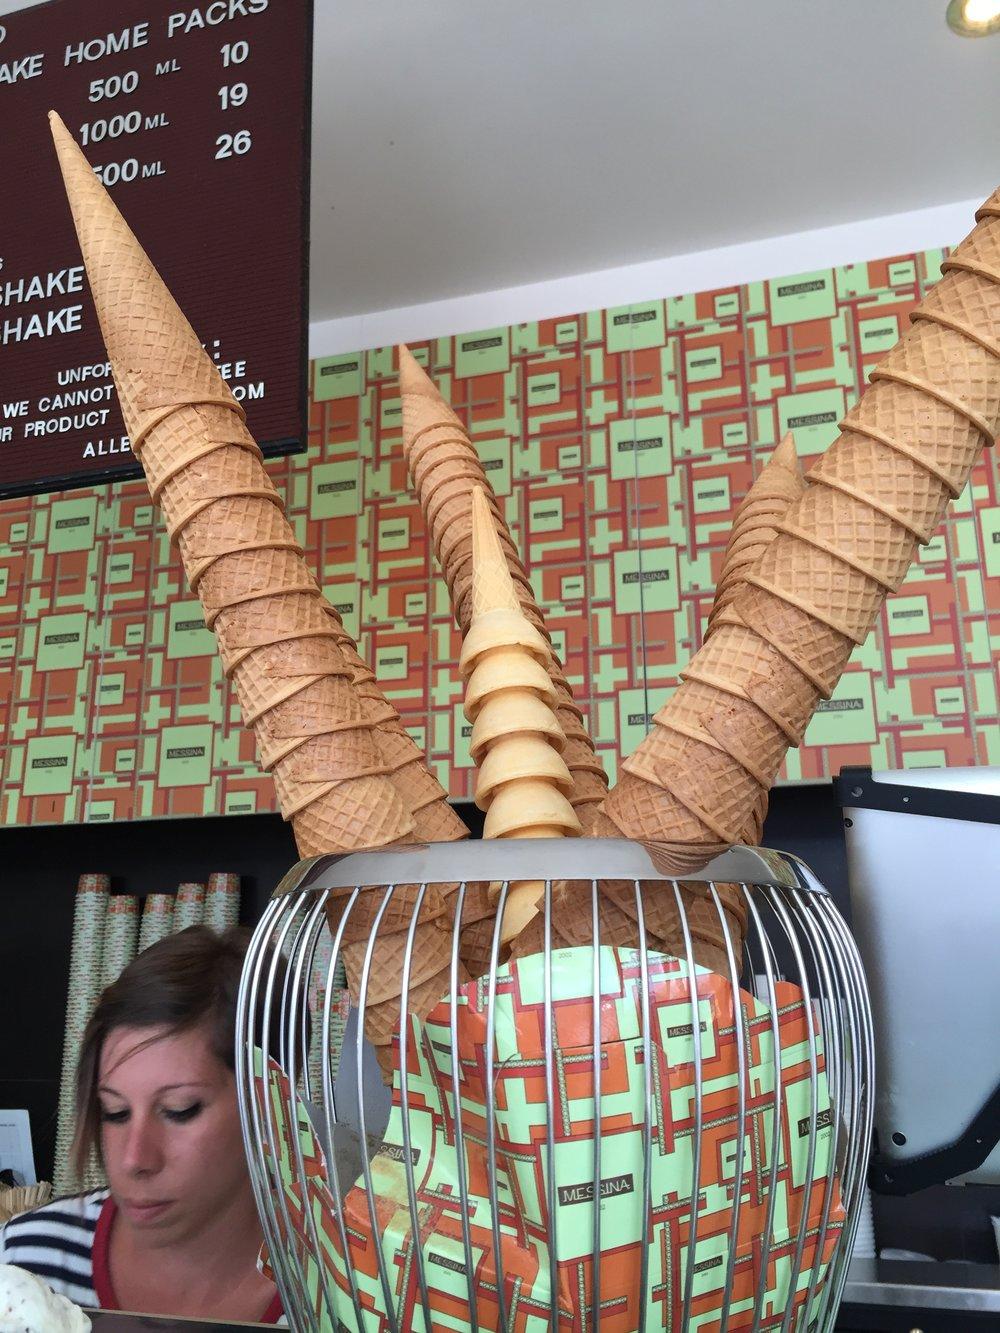 Messina Ice Cream is my favorite!